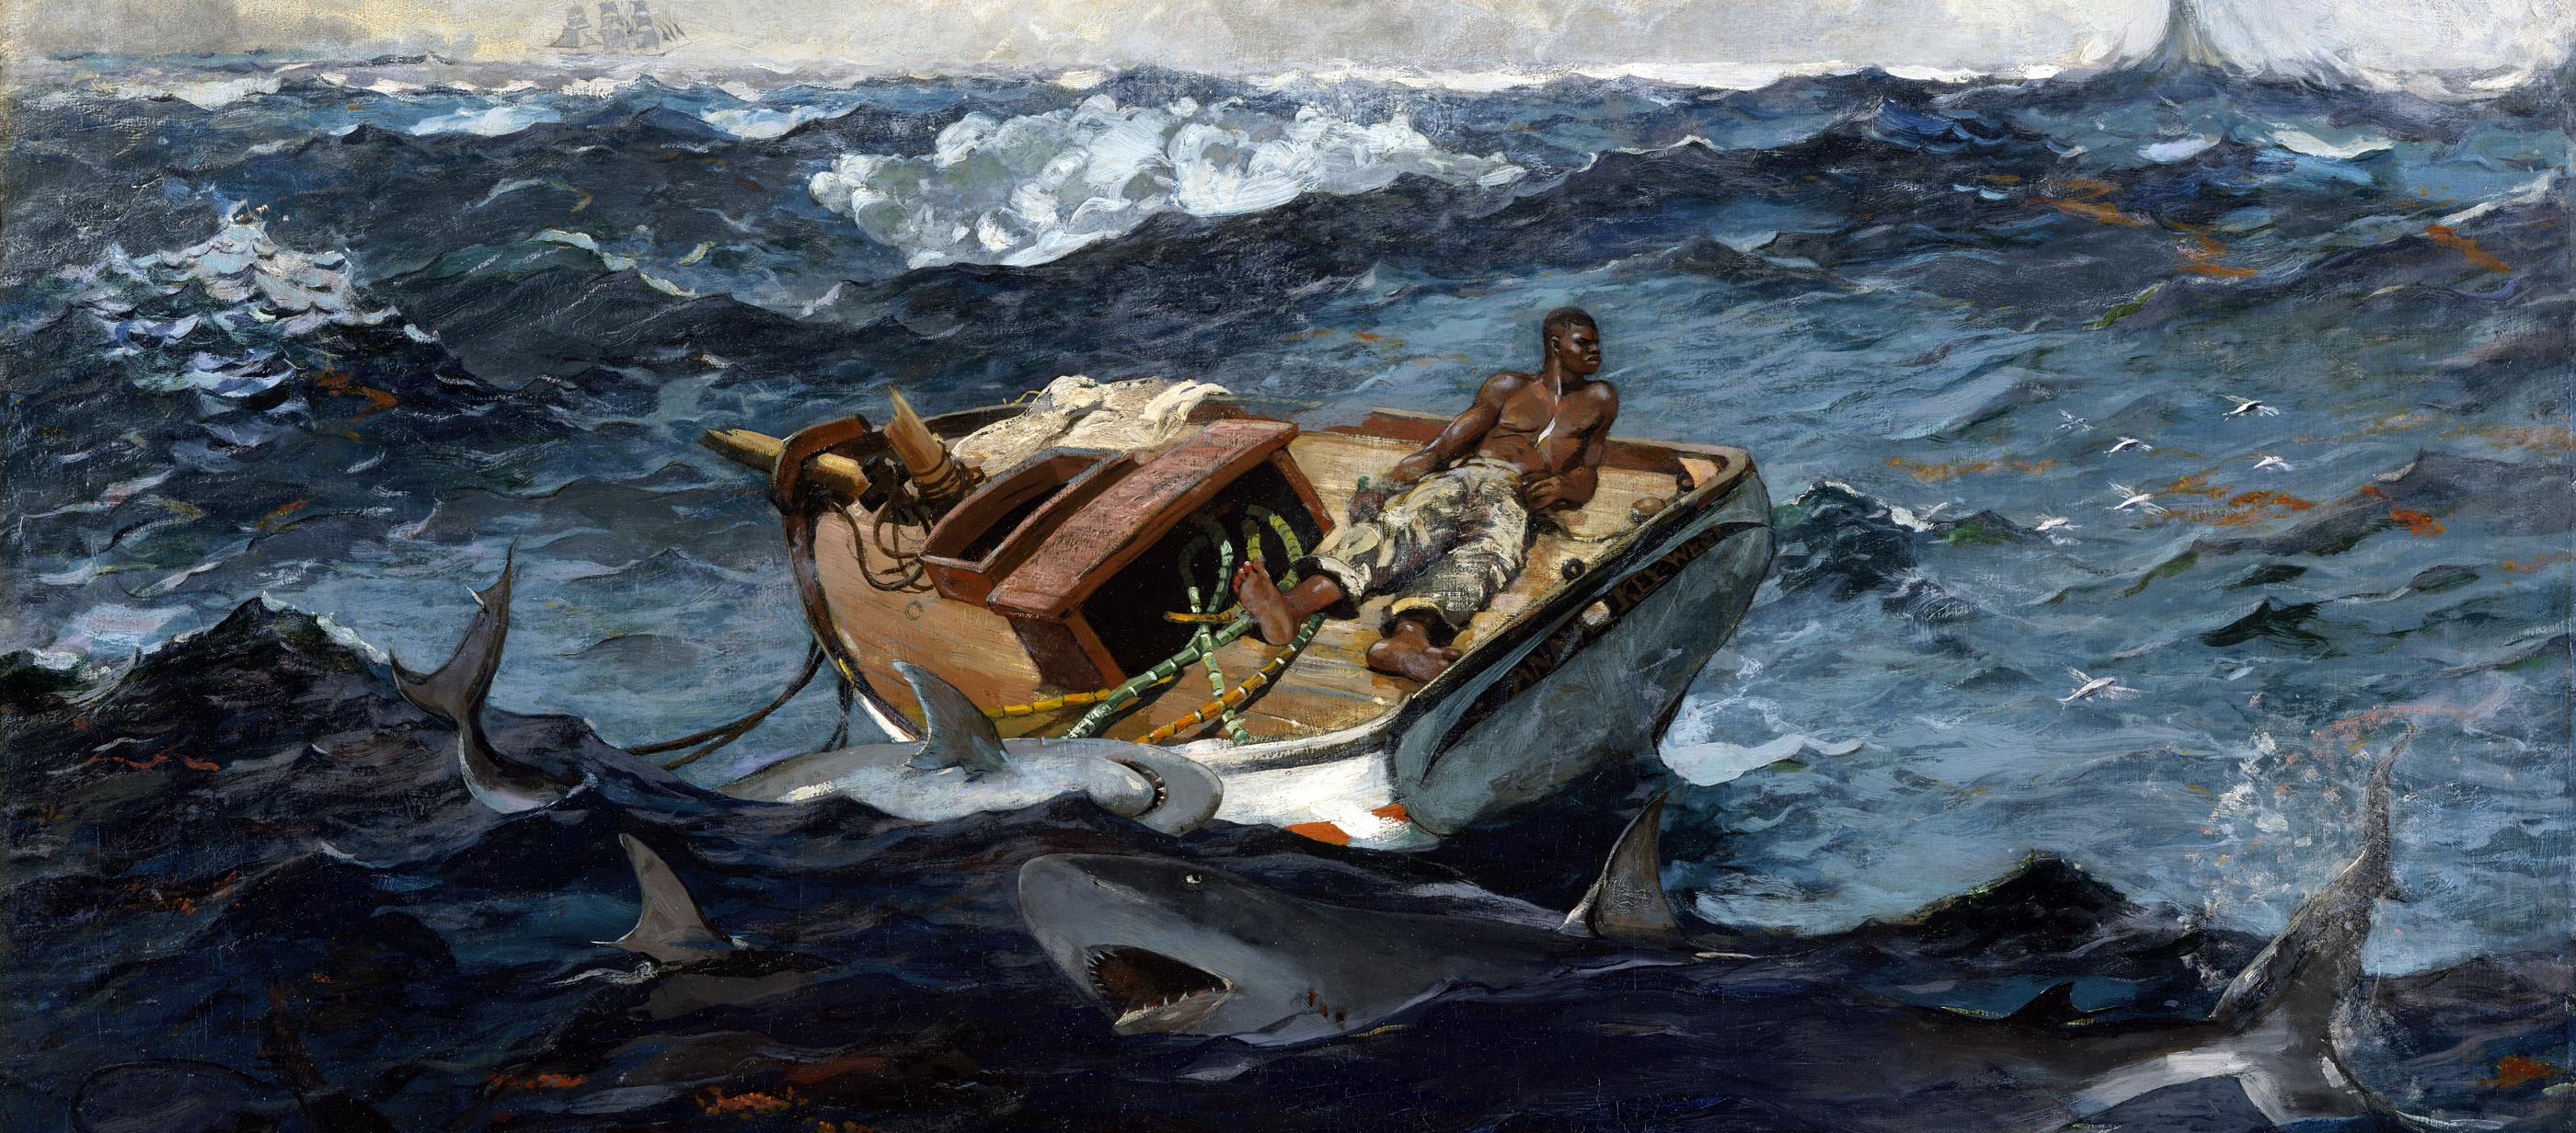 The Gulf Stream, by Winslow Homer, 1899.